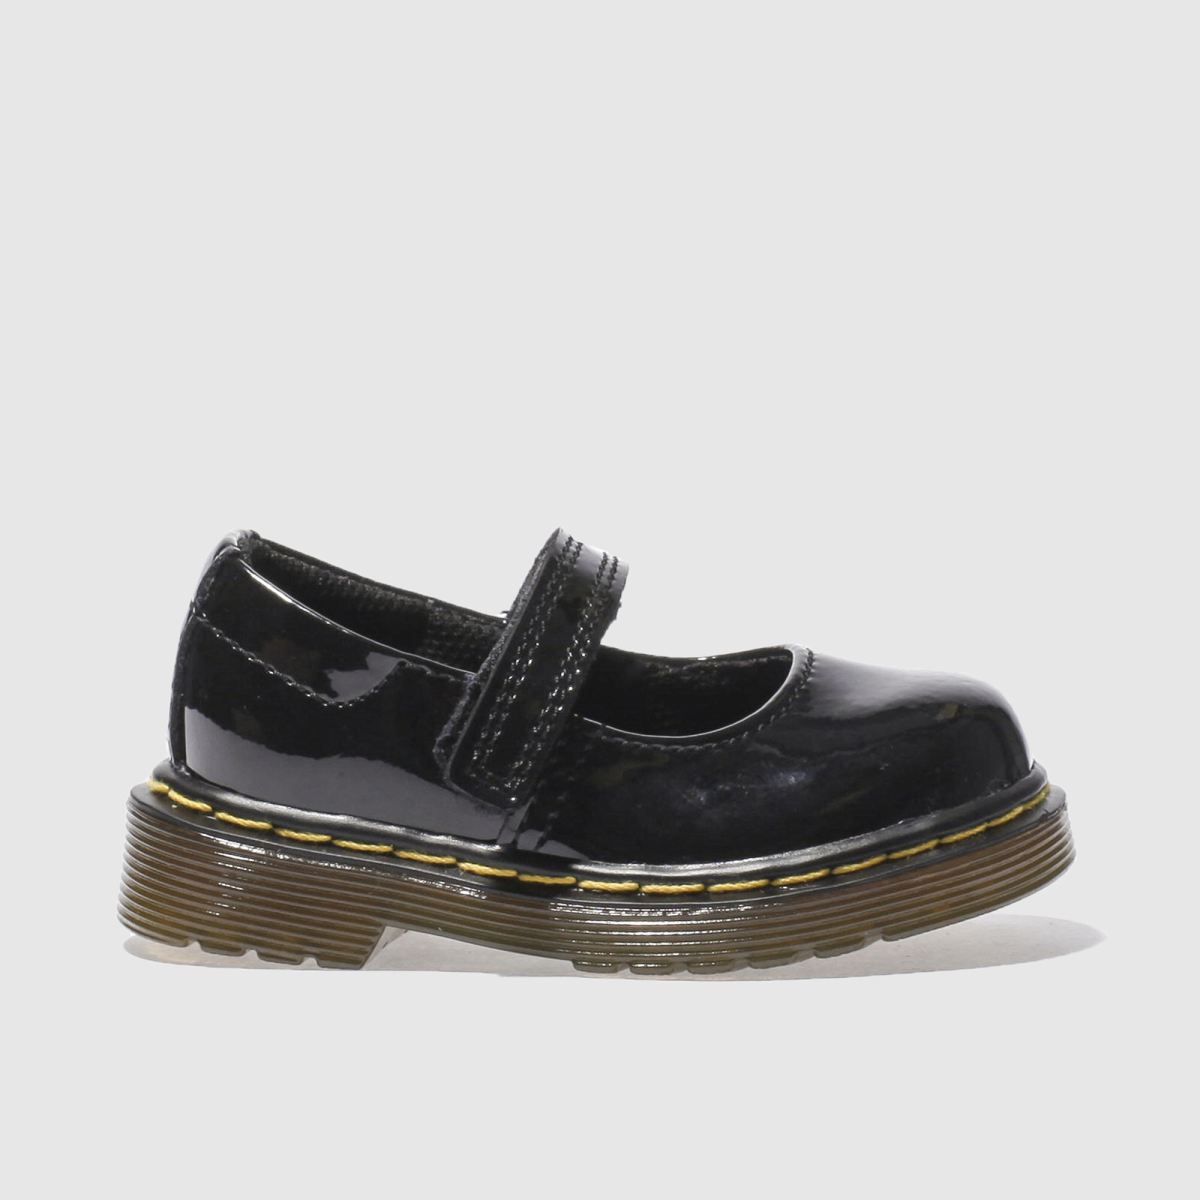 Dr Martens Black Maccy Girls Toddler Shoes